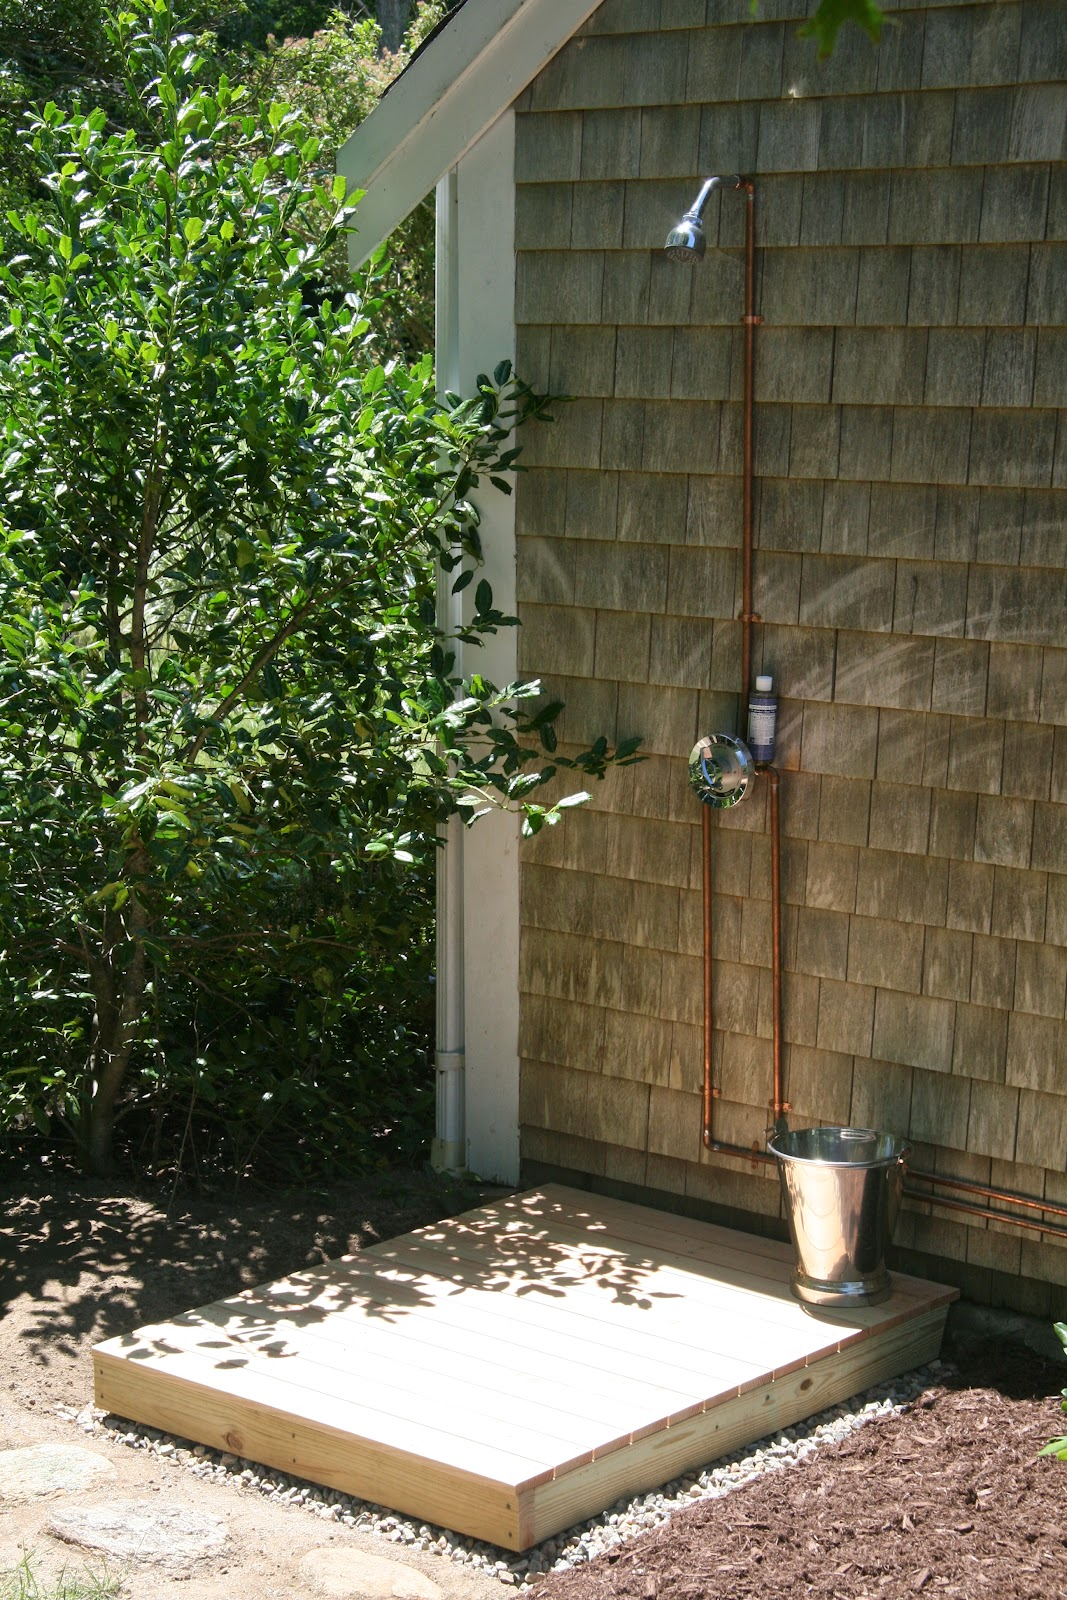 An Old Farm: Building an Outdoor Shower